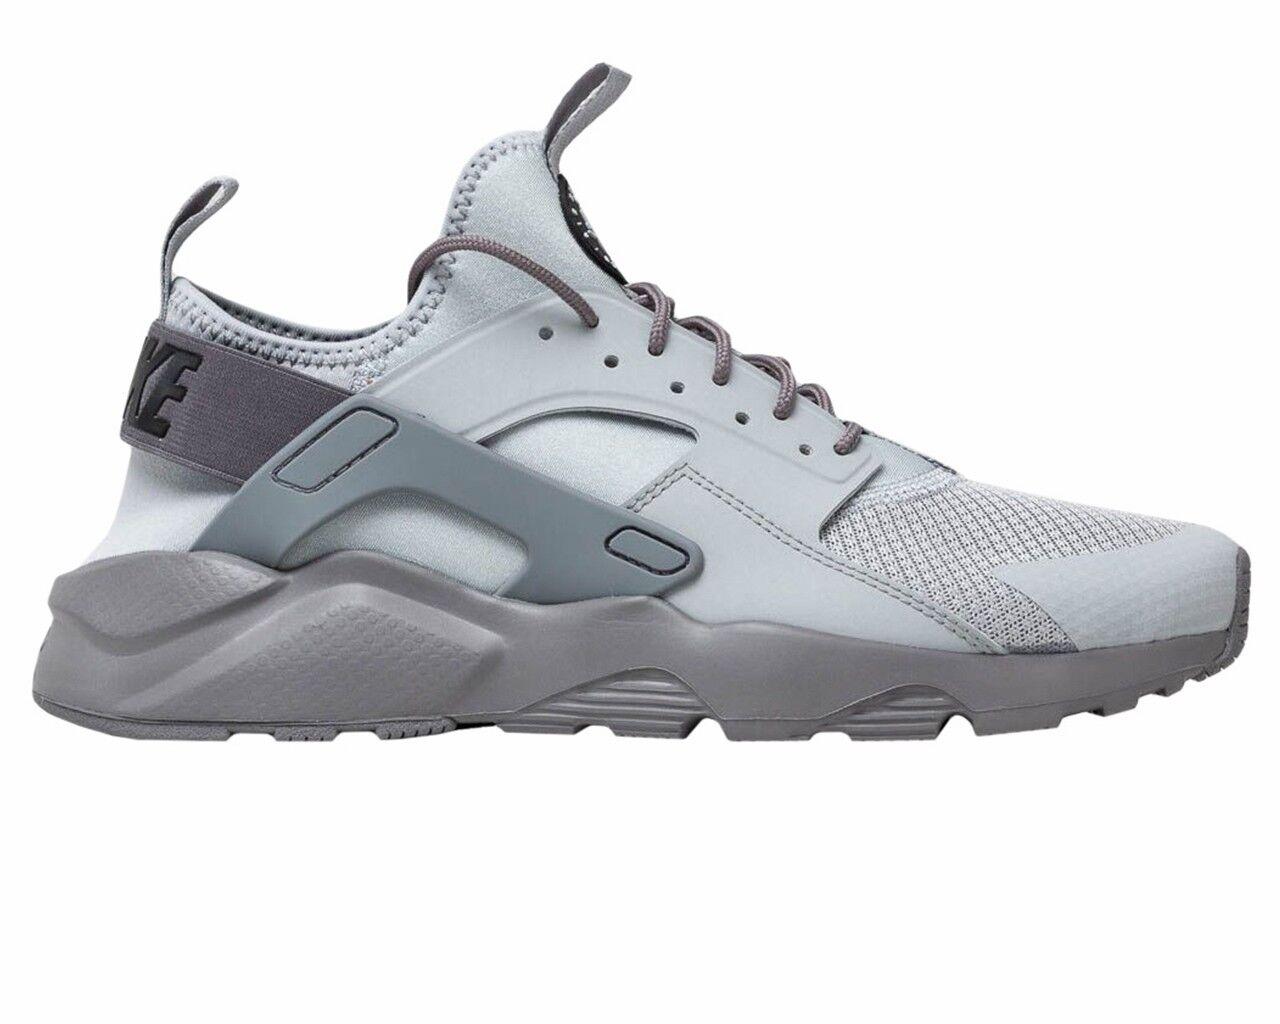 Nike huarache laufen ultra 819685 021 aire gris zapatillas hombre gris aire gimnasio zapatos d54039